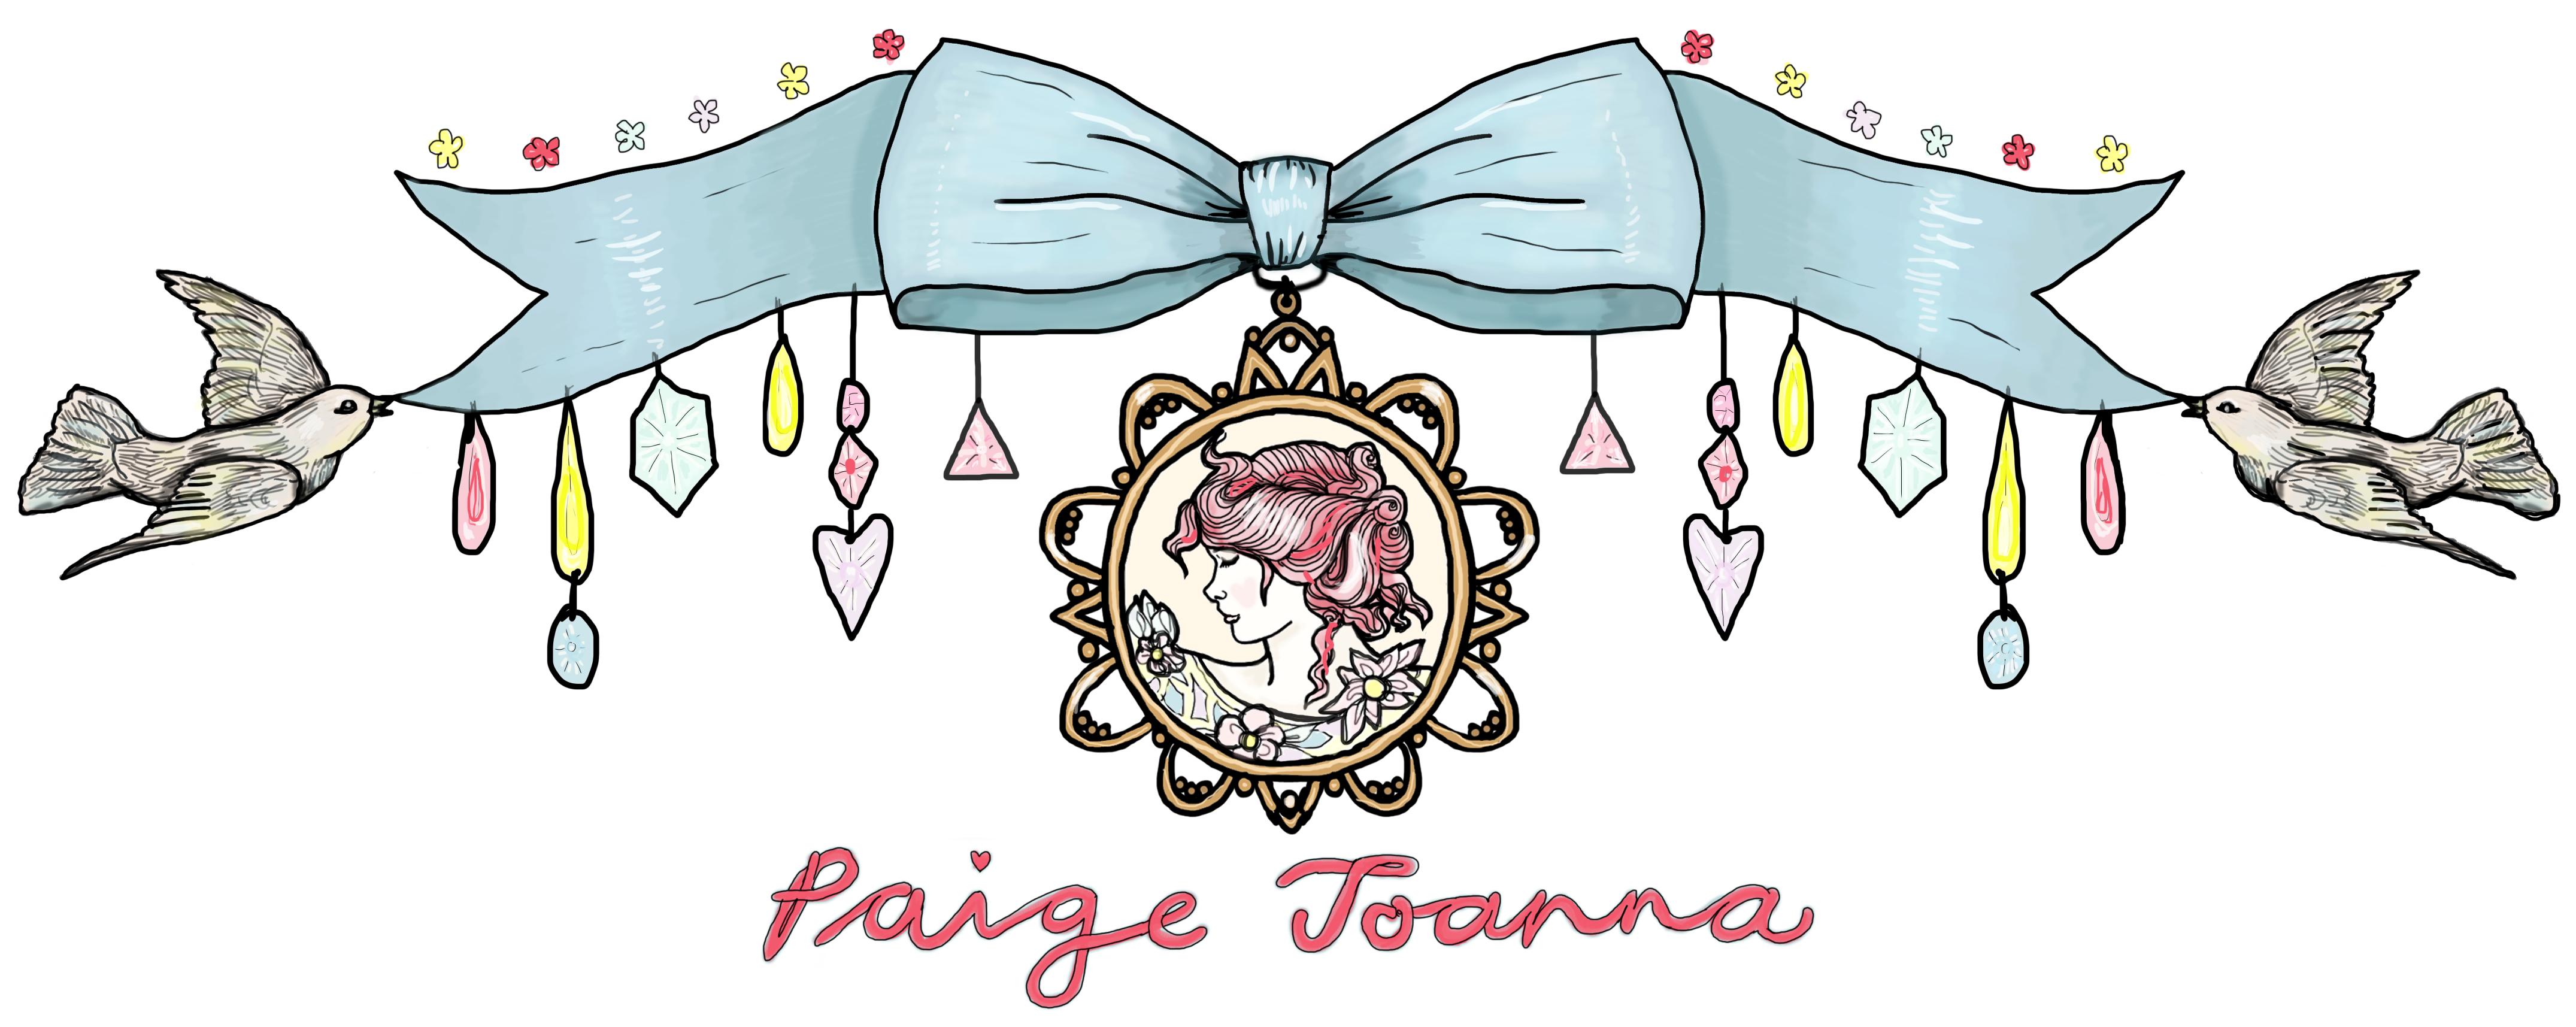 Paige Joanna